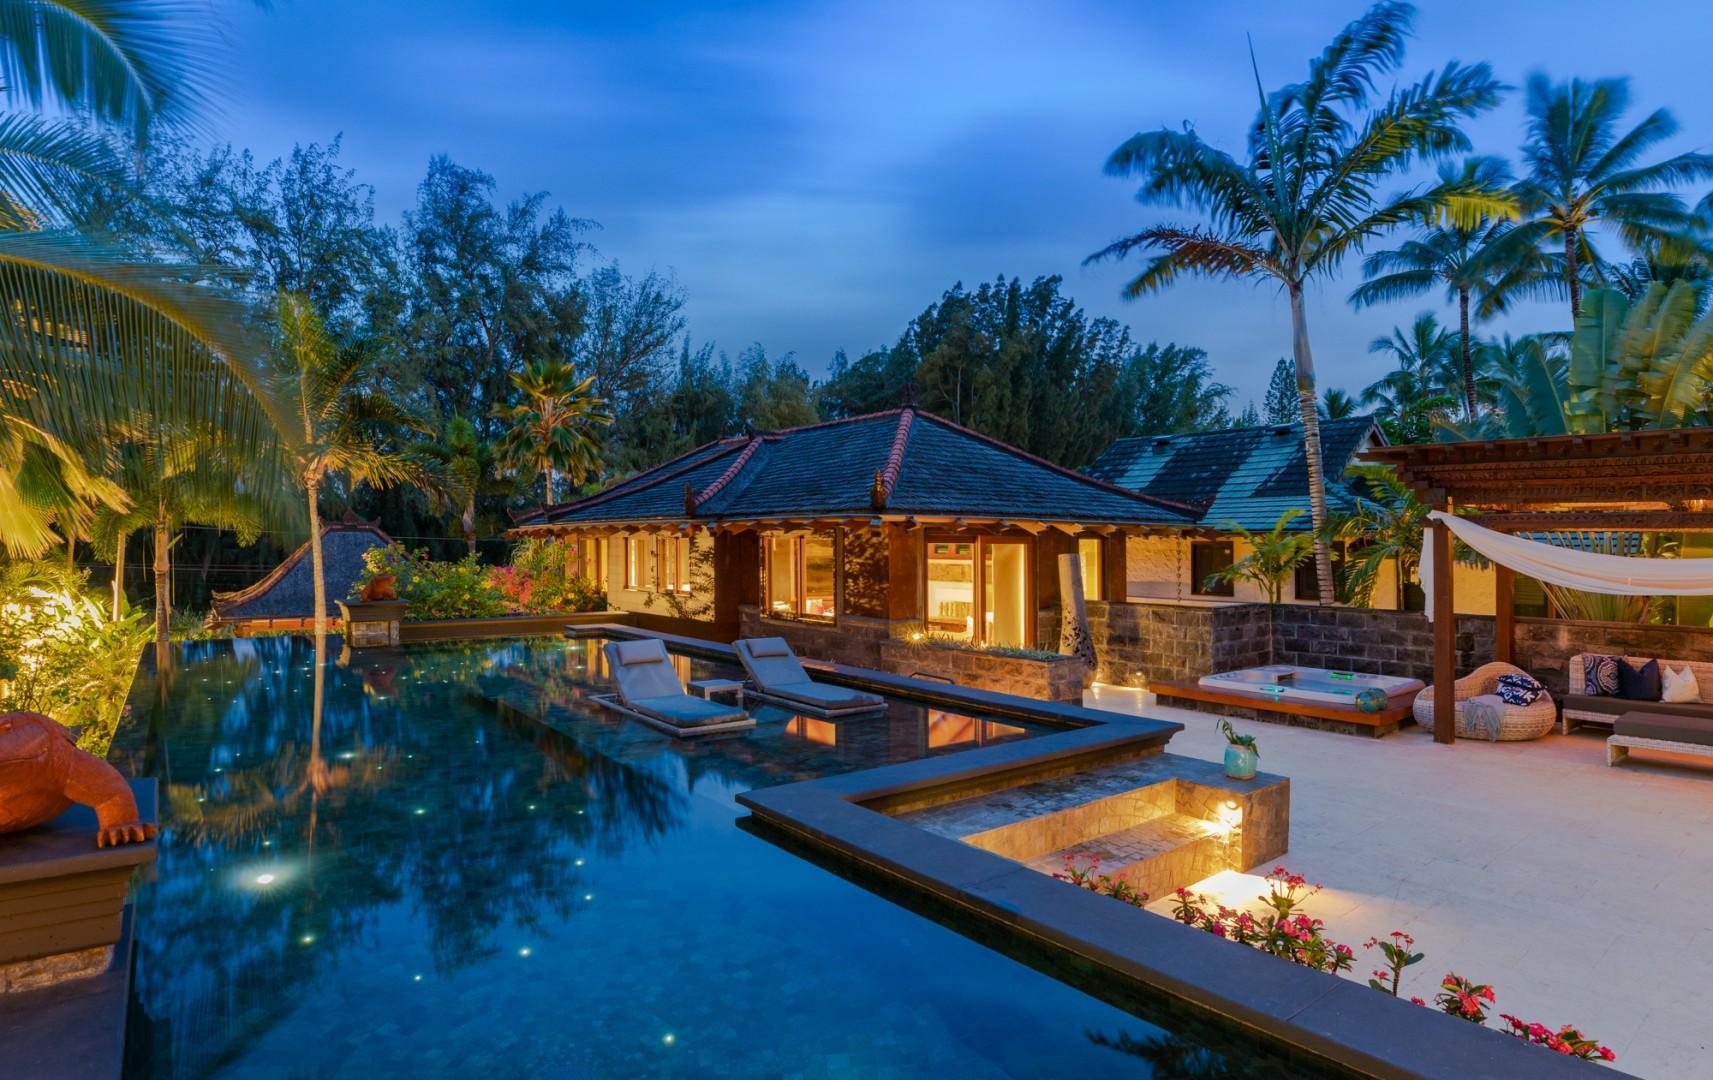 Pool Courtyard at Twilight